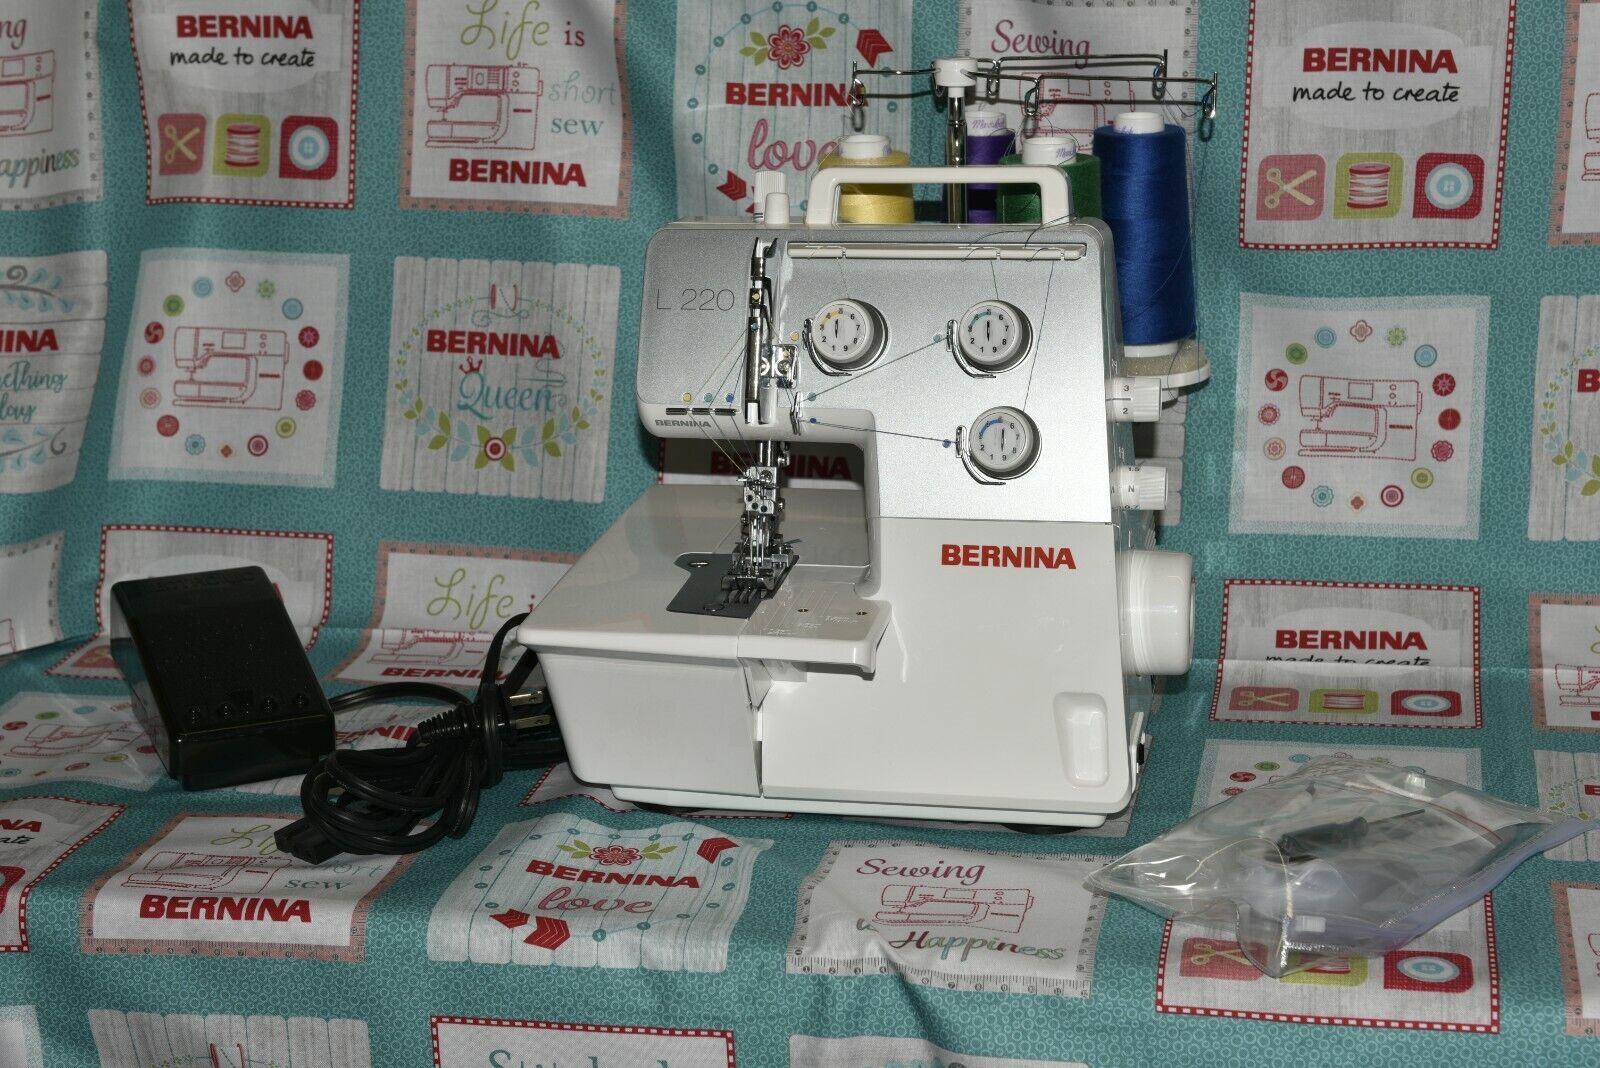 Bernina L220 Serger Cover-Chain and Stitch 1, 2 , 3, nee